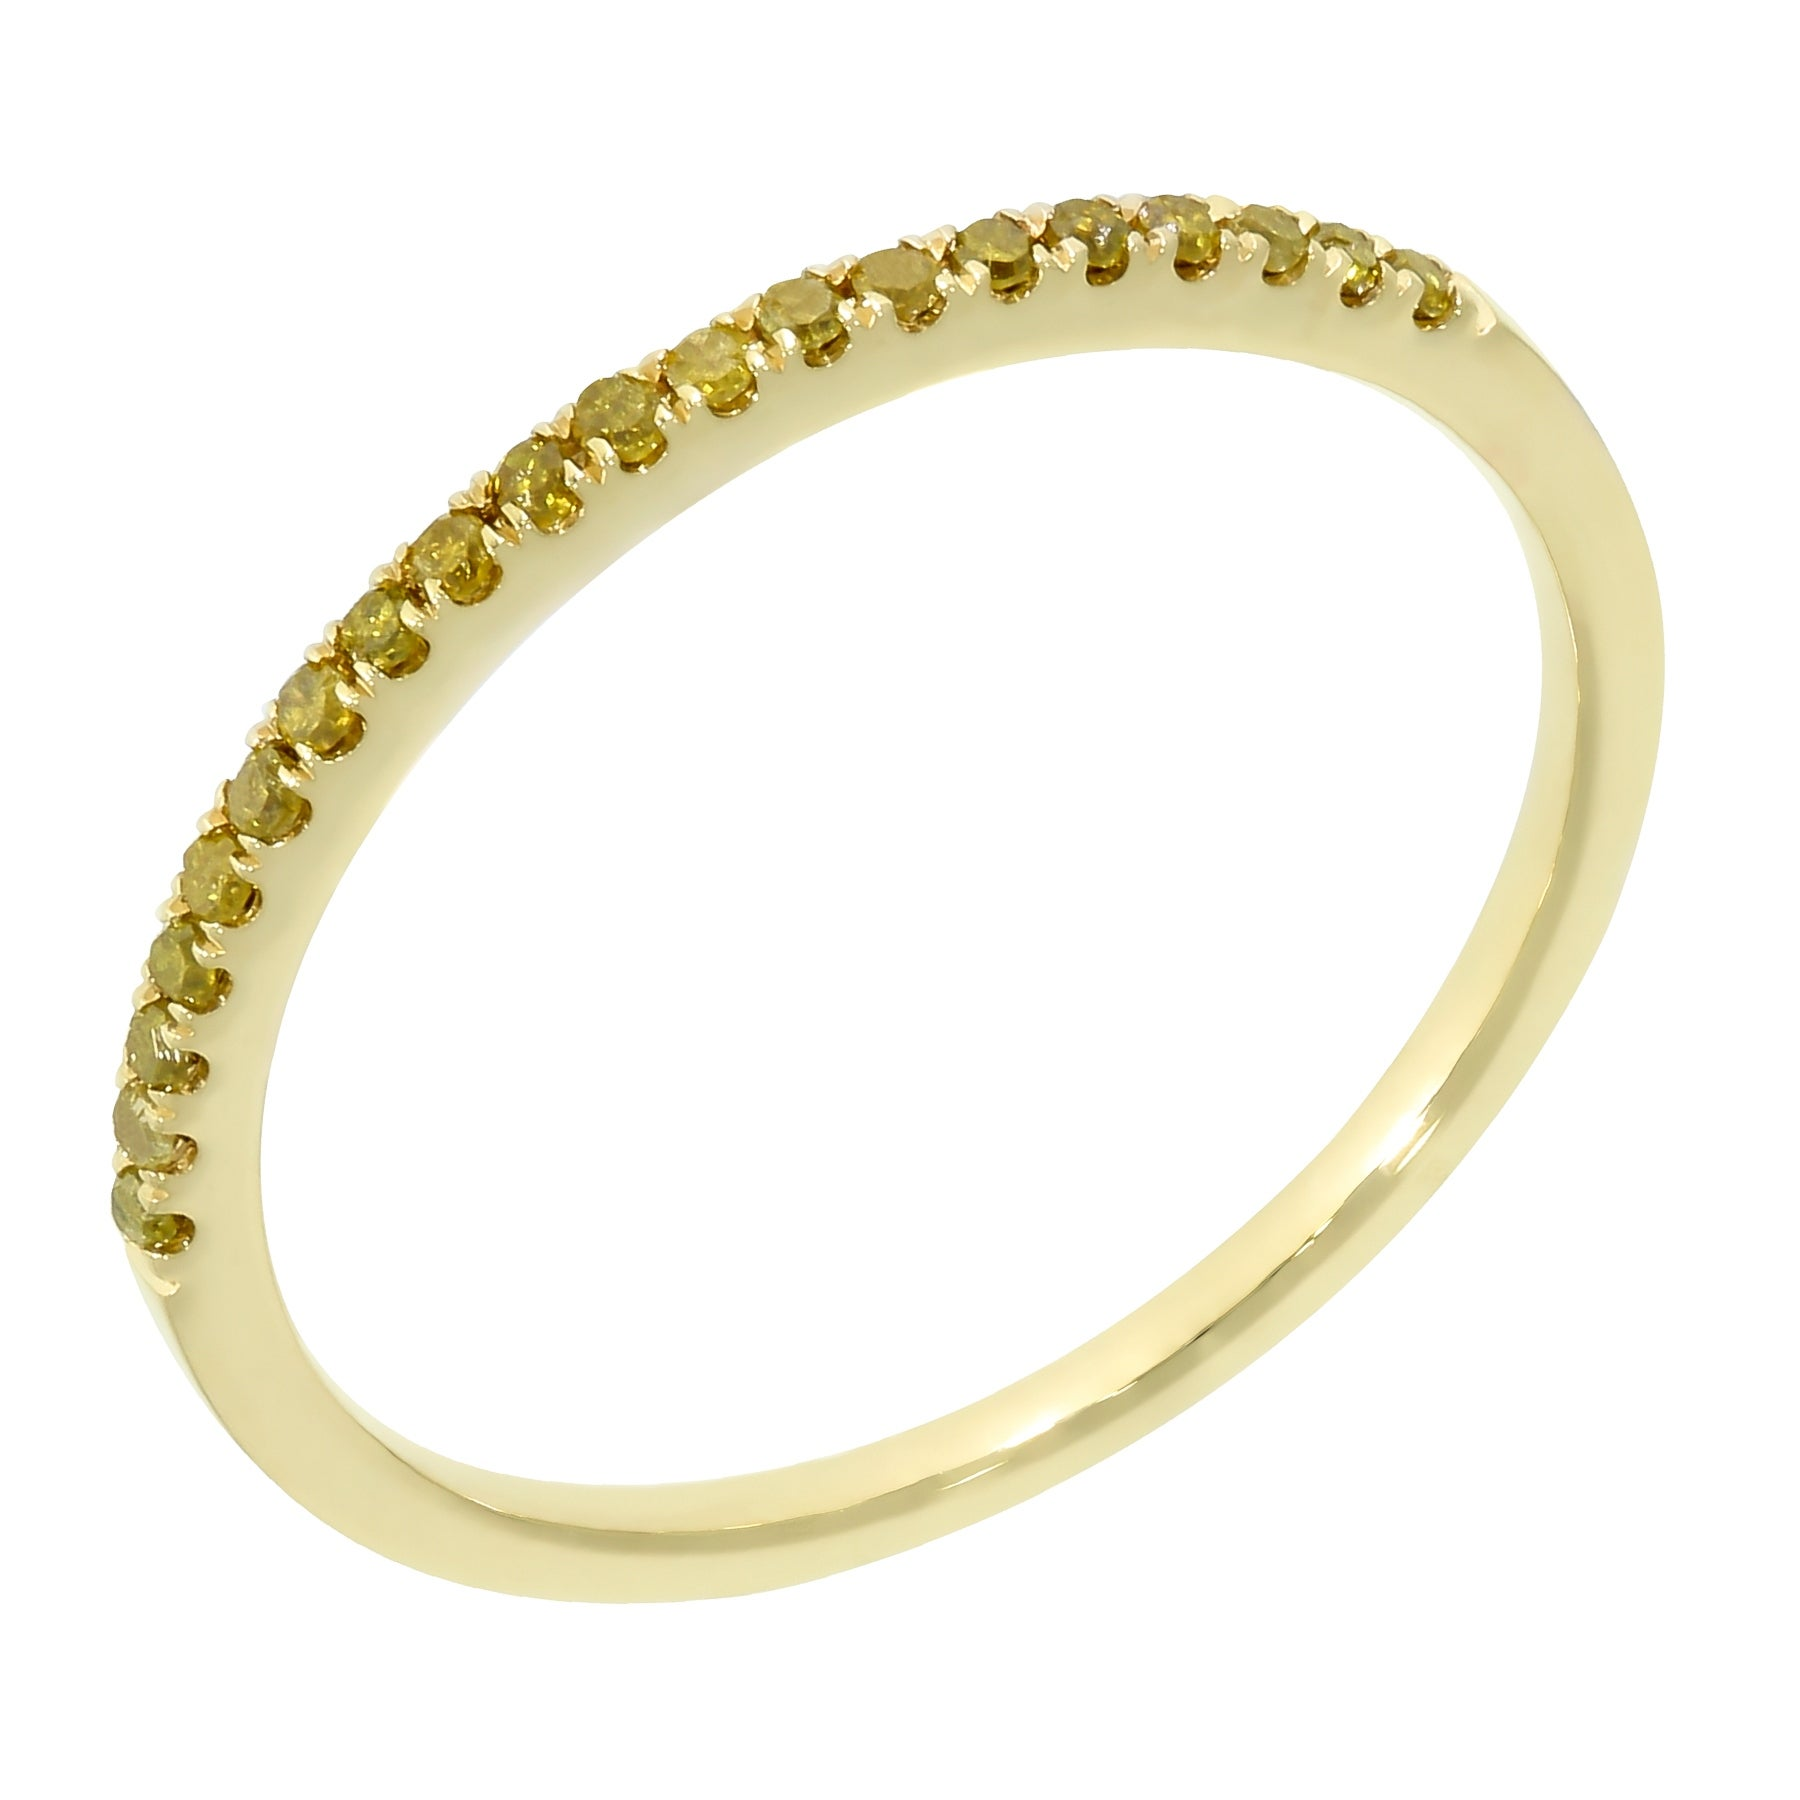 Prism Jewel 0.15Ct Yellow Diamond Anniversary Band - Thumbnail 0